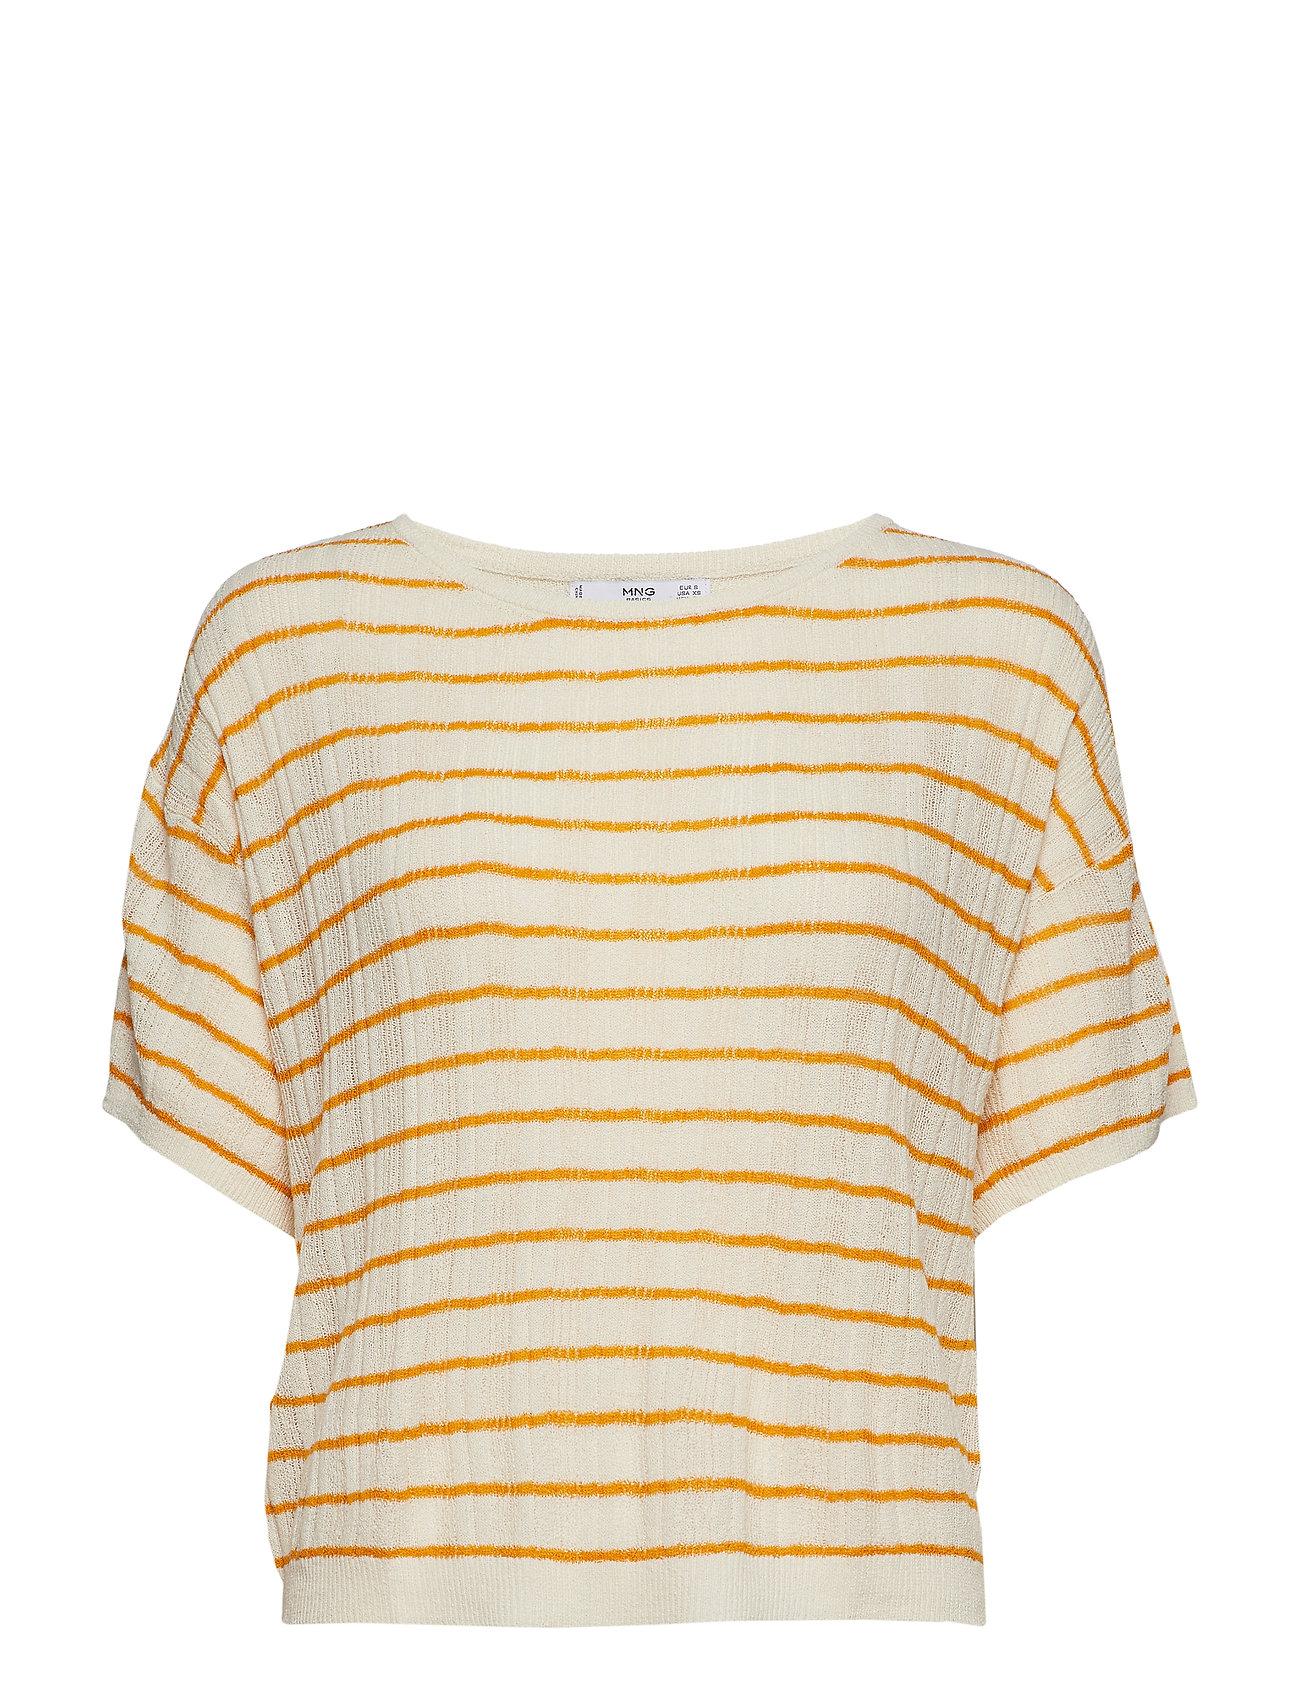 Mango Ribbed knit sweater - LIGHT BEIGE